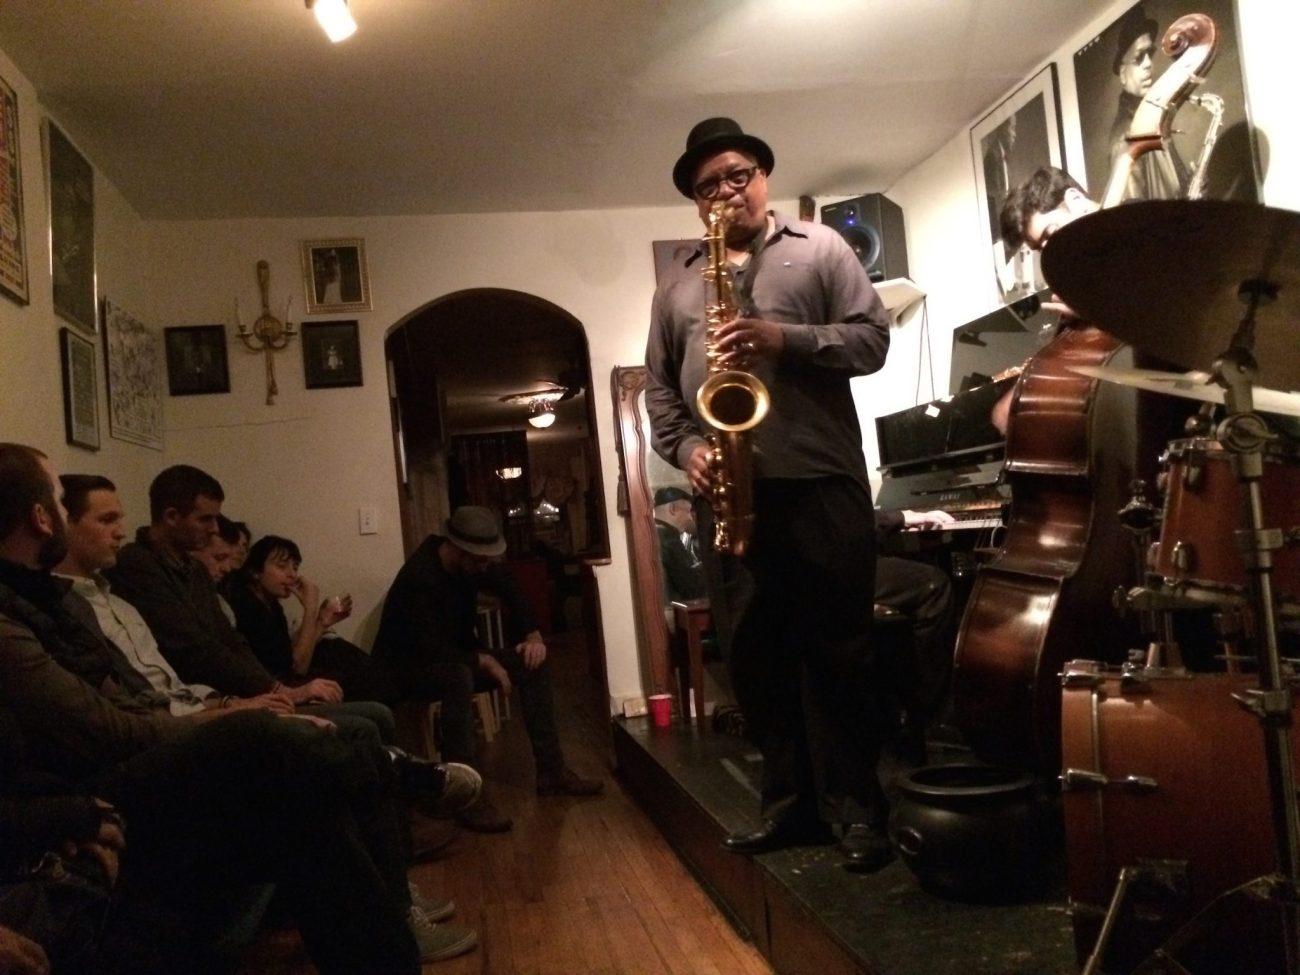 Bill Saxton Playing Saxaphone at Bill's Place